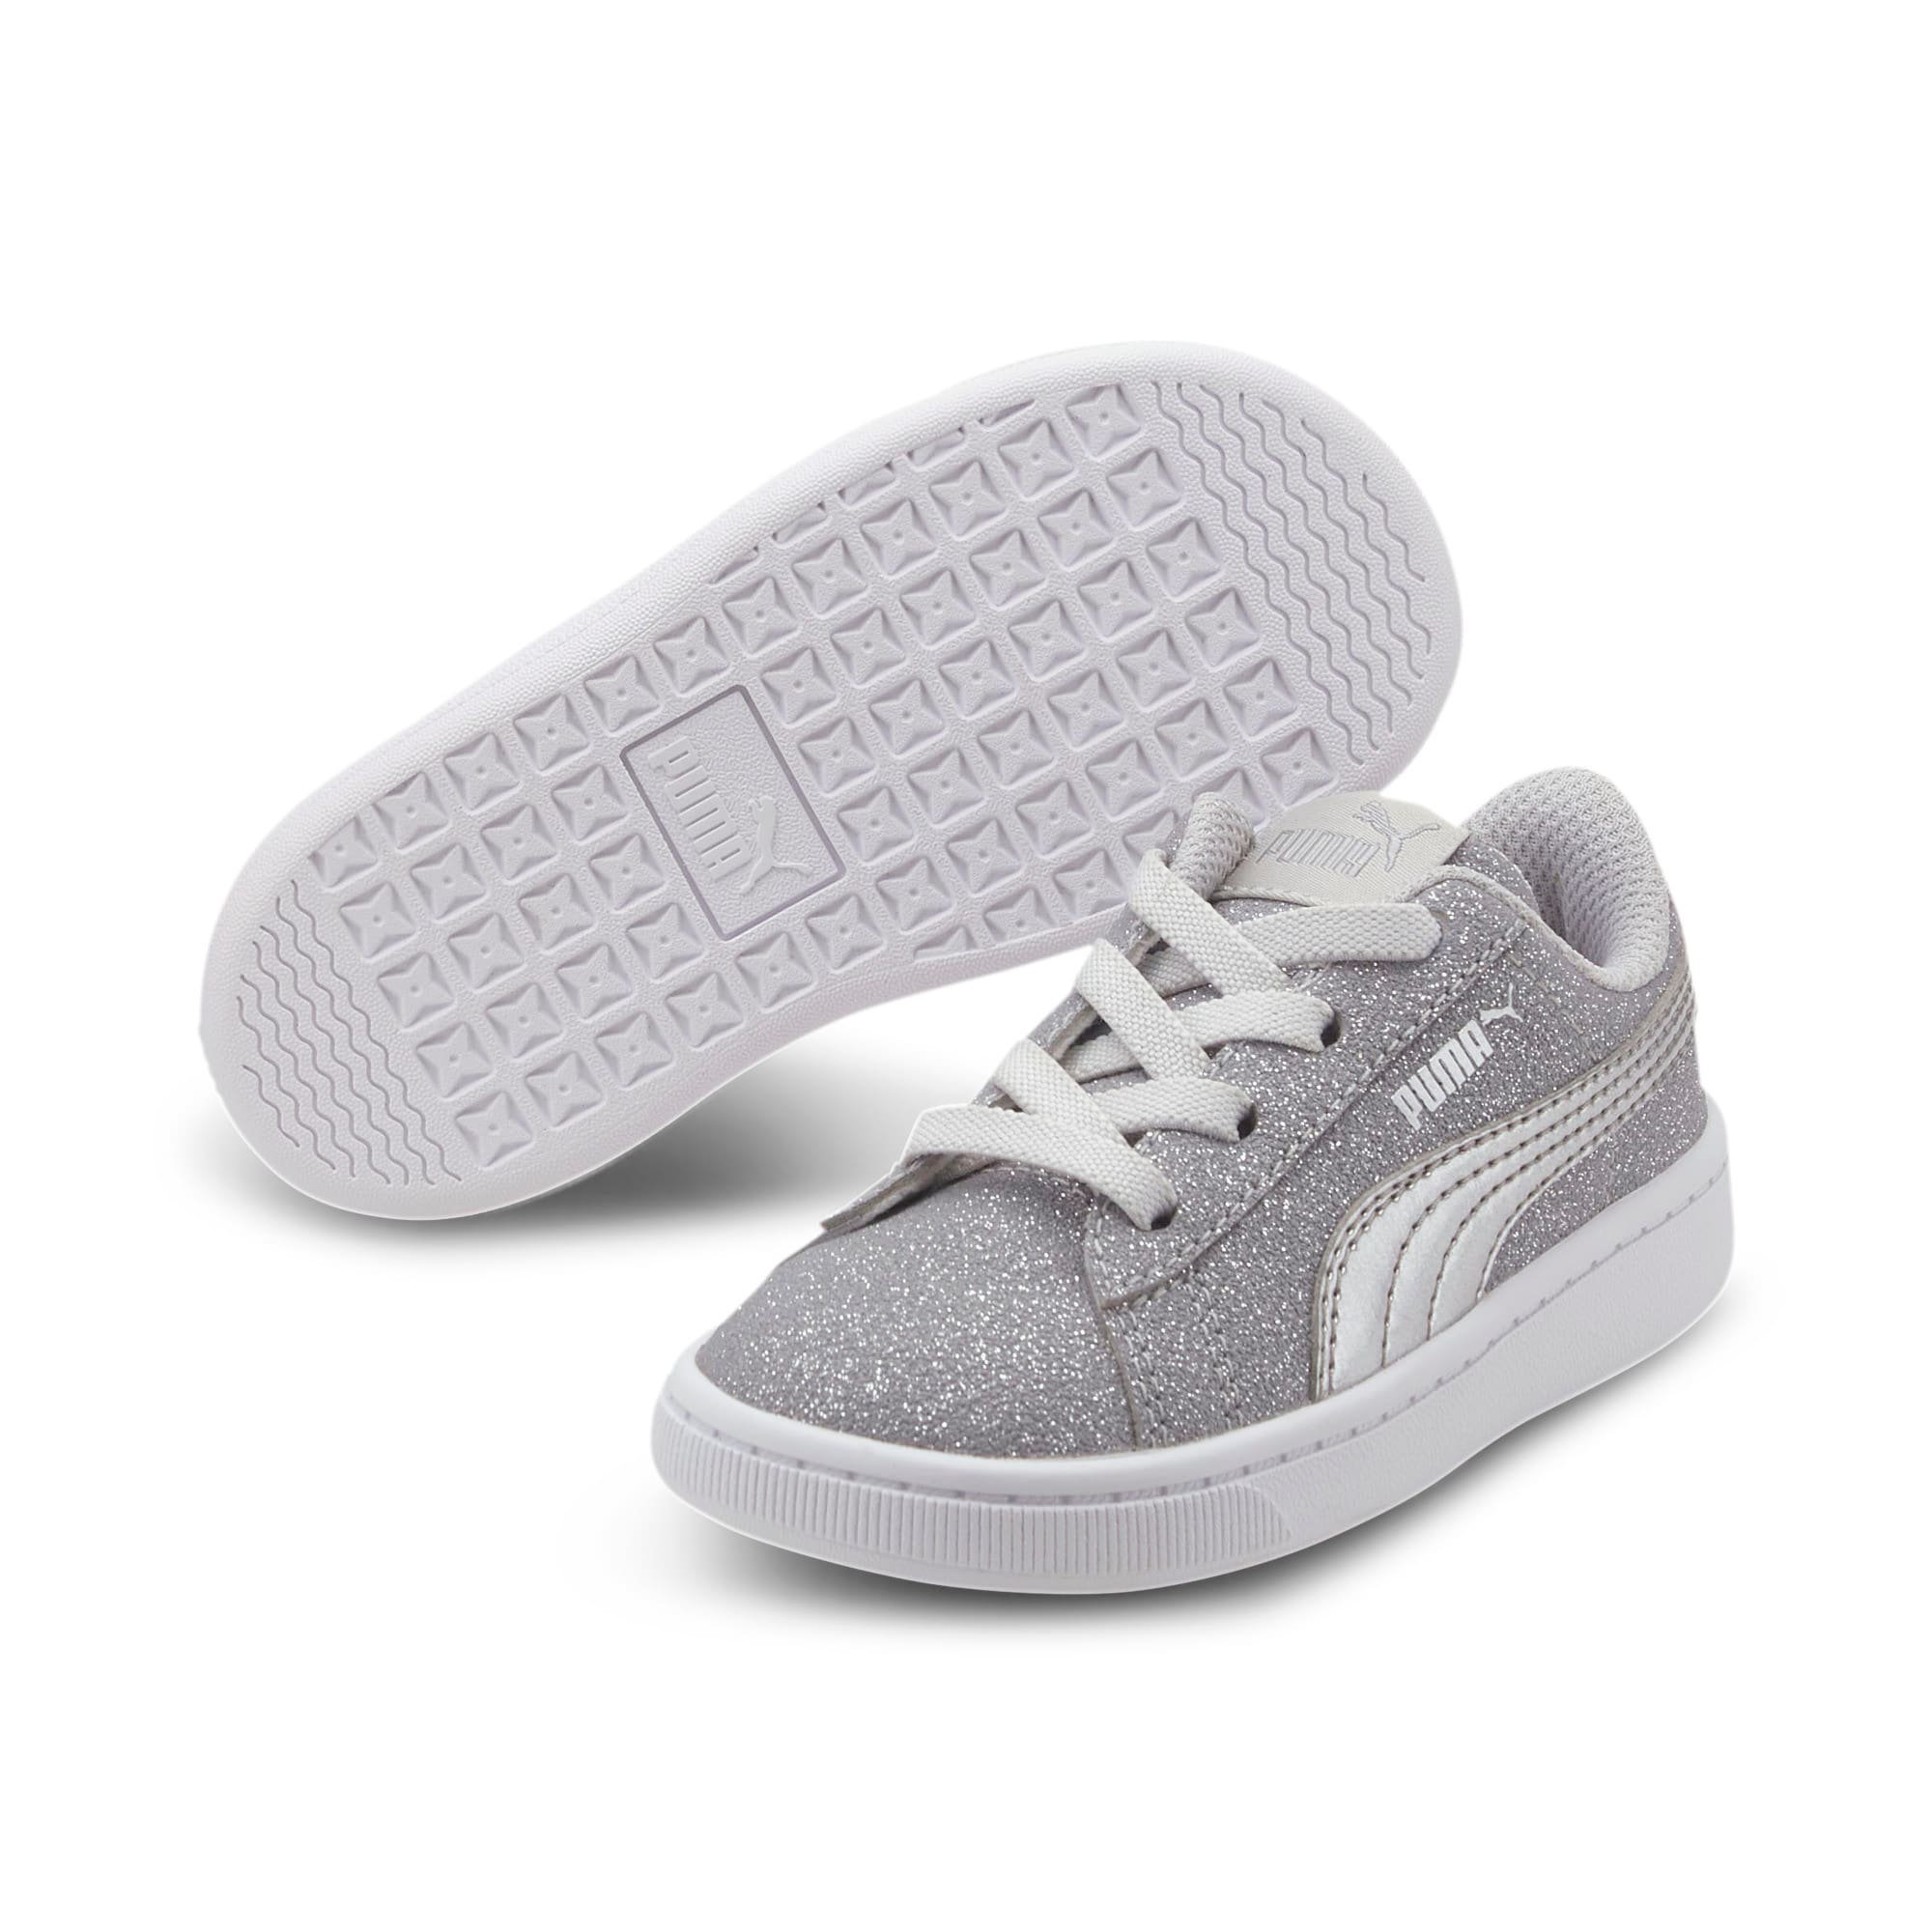 Thumbnail 2 of PUMA Vikky v2 Glitz AC Sneakers INF, Gray Violet-Silver-White, medium